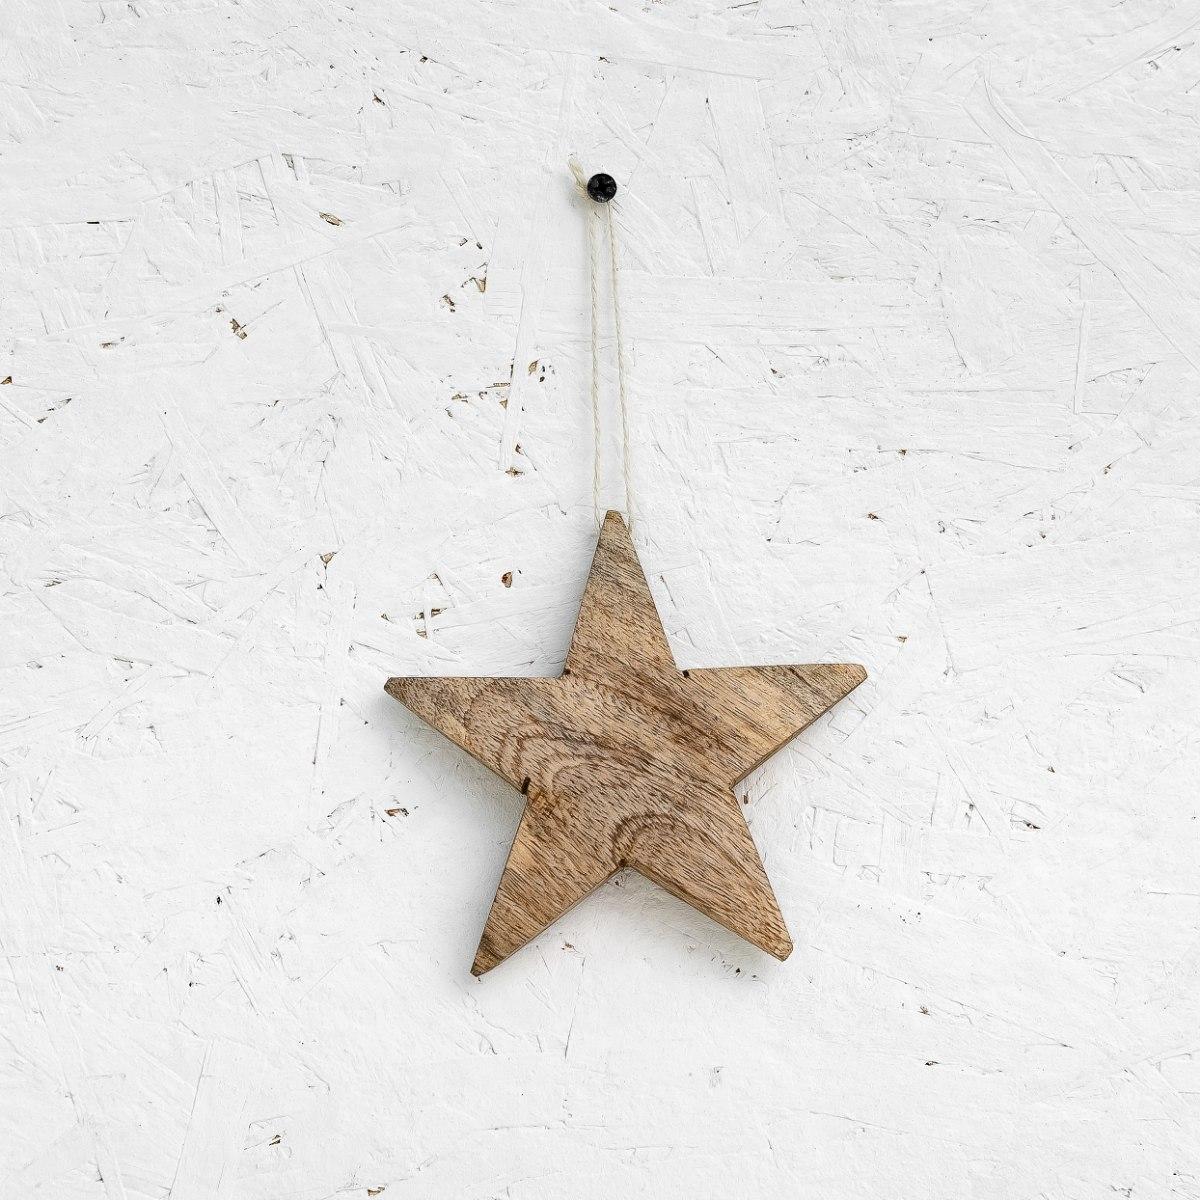 כוכב עץ - טבעי